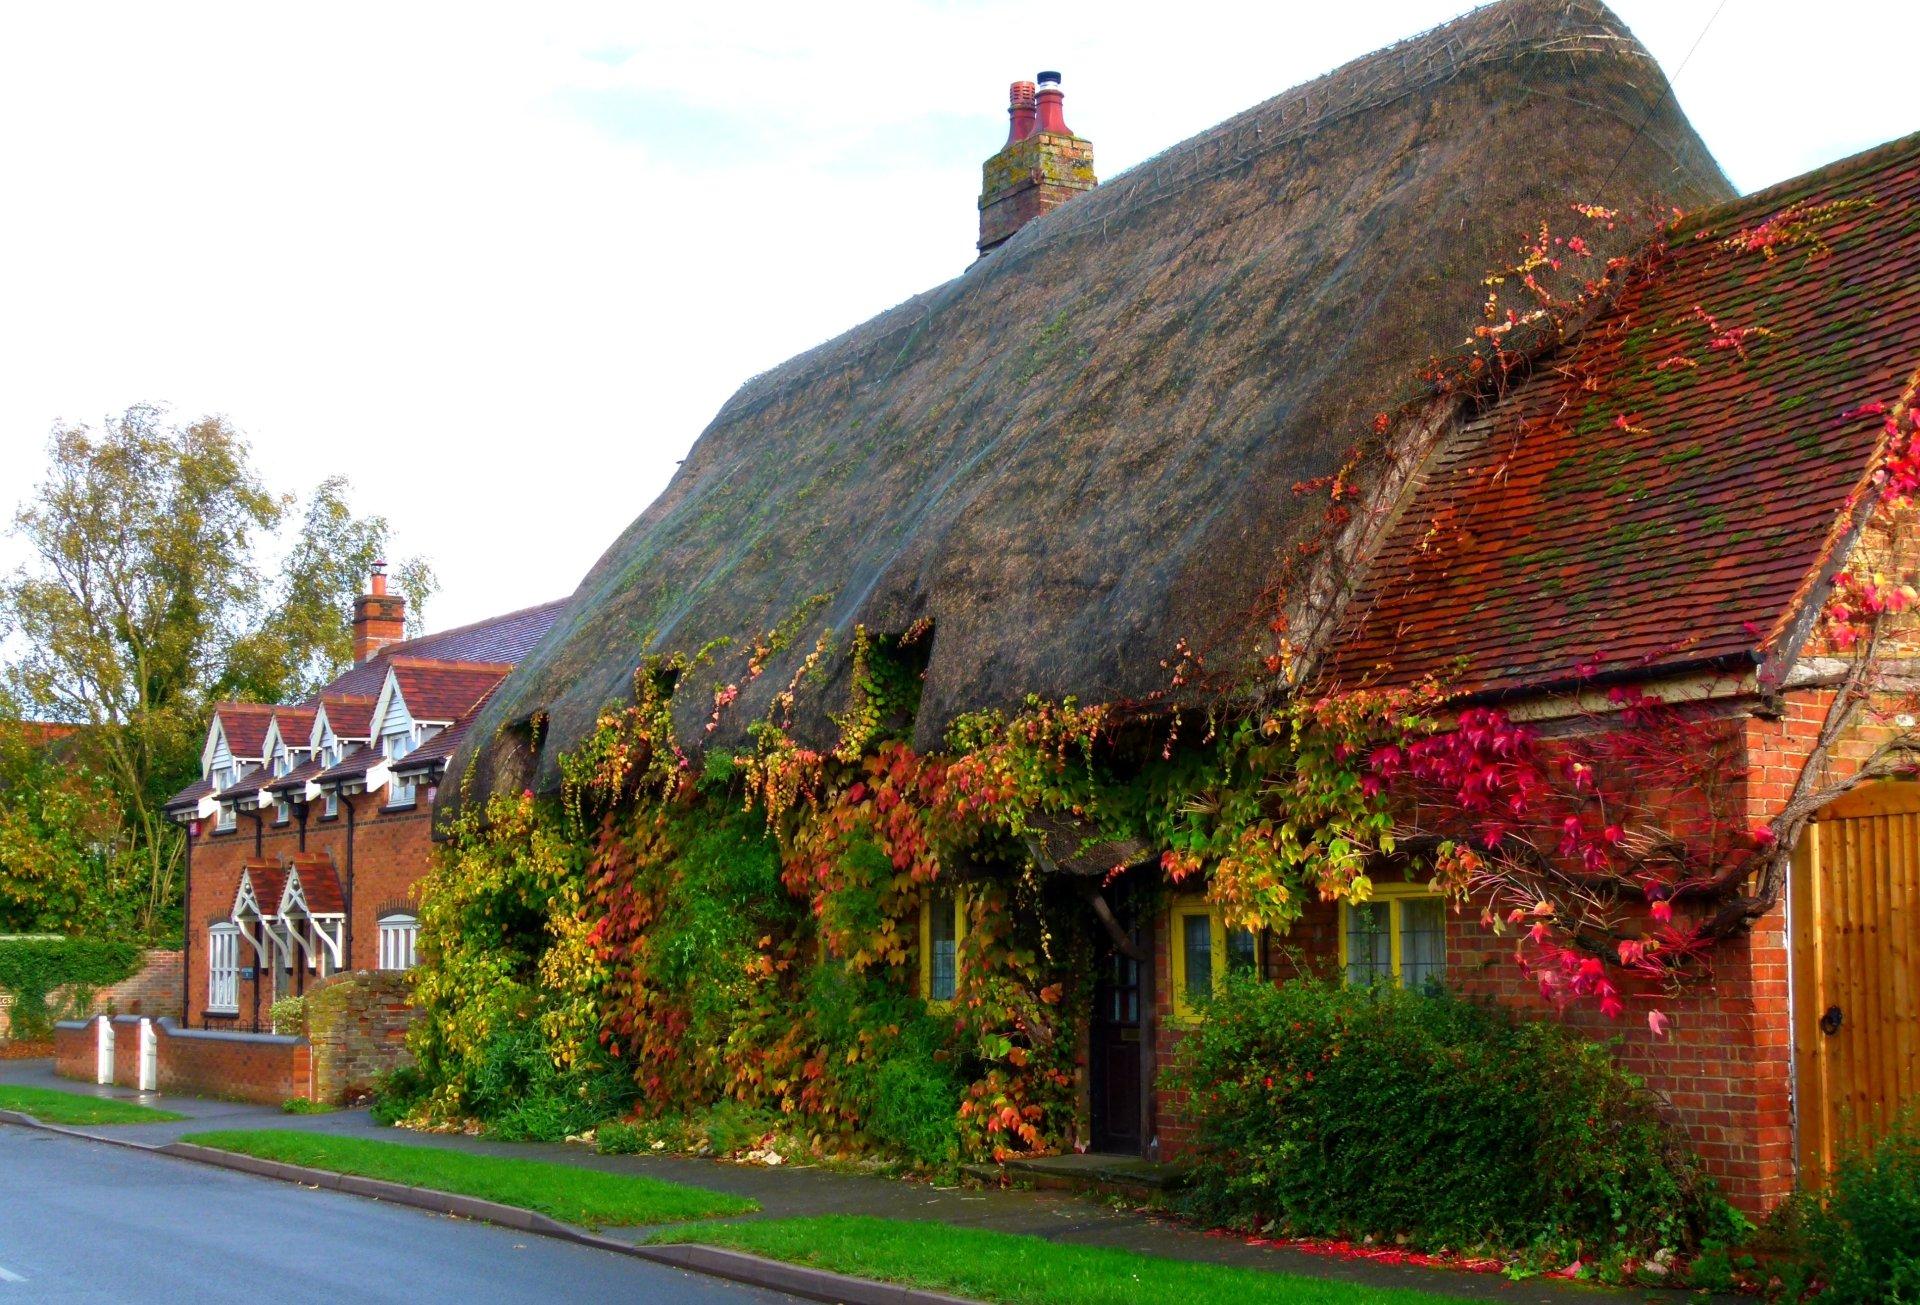 Bing Hd Wallpaper Fall House In England 4k Ultra Hd Wallpaper Background Image